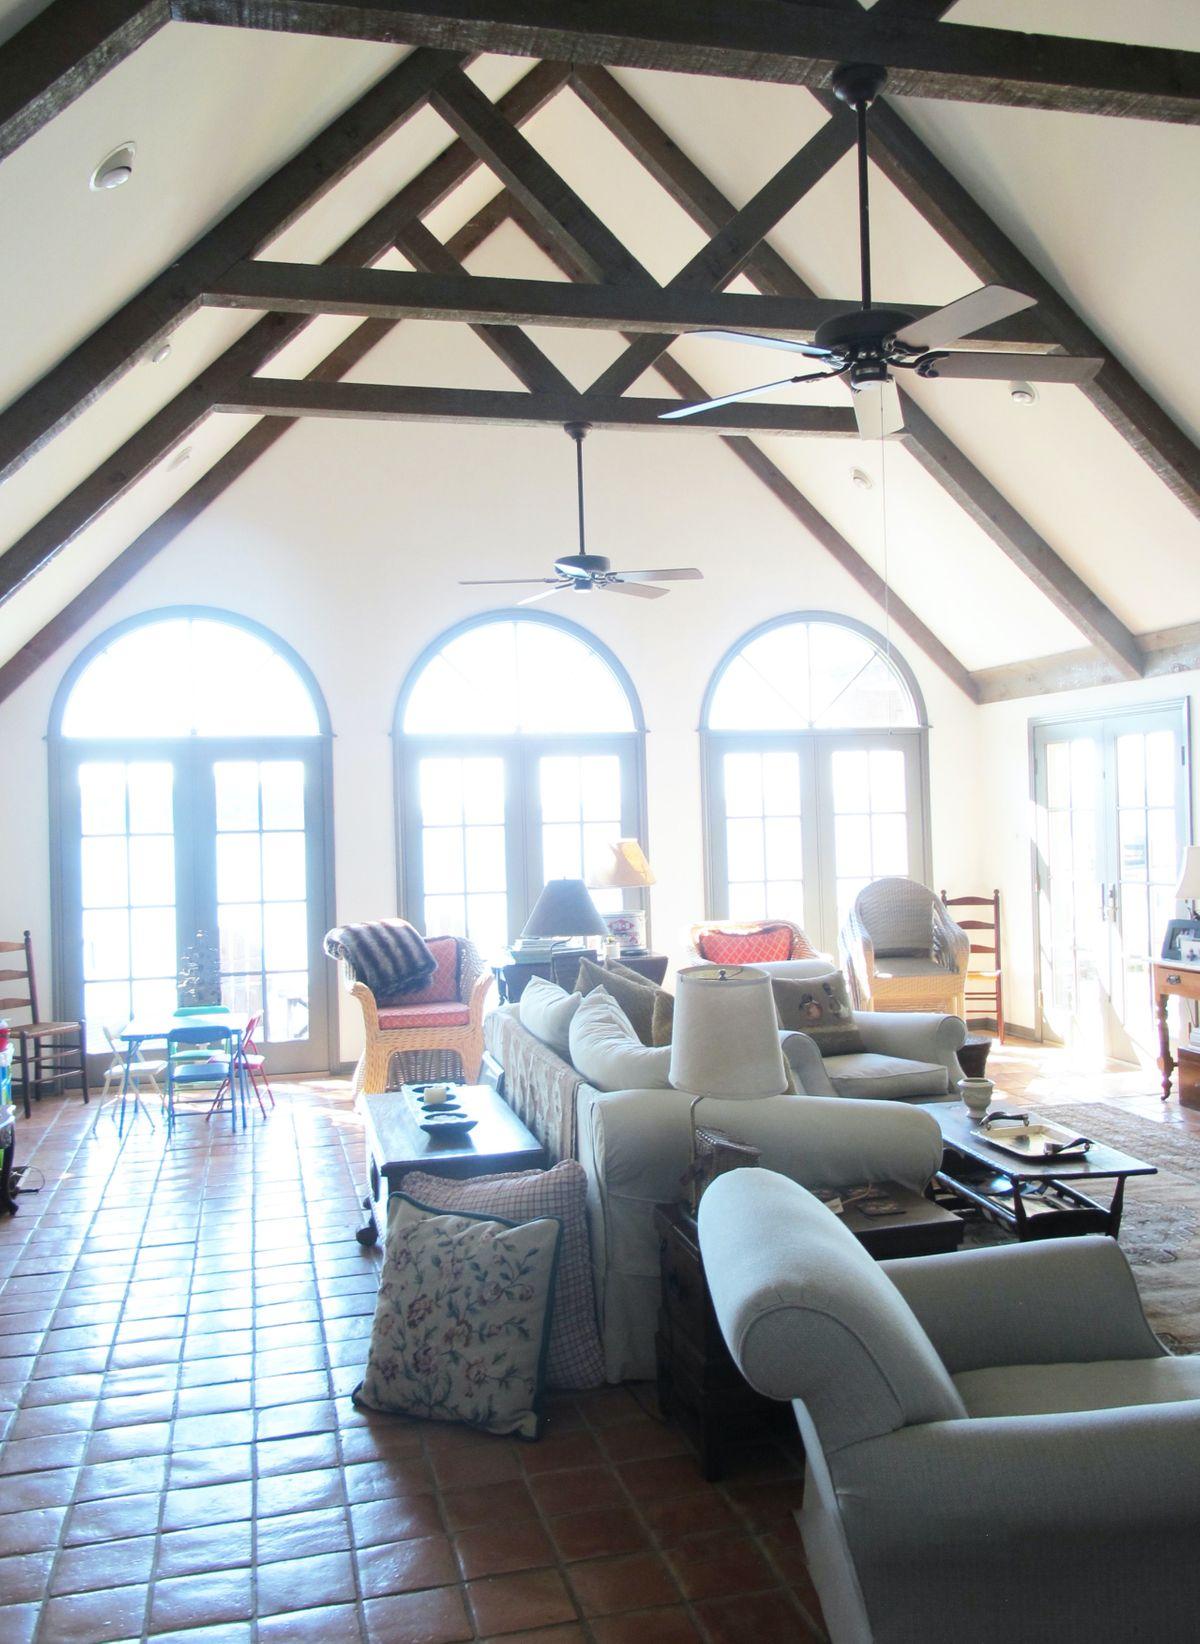 Pola Lakehouse Video Shoot Location Homes Dallas 52.jpg